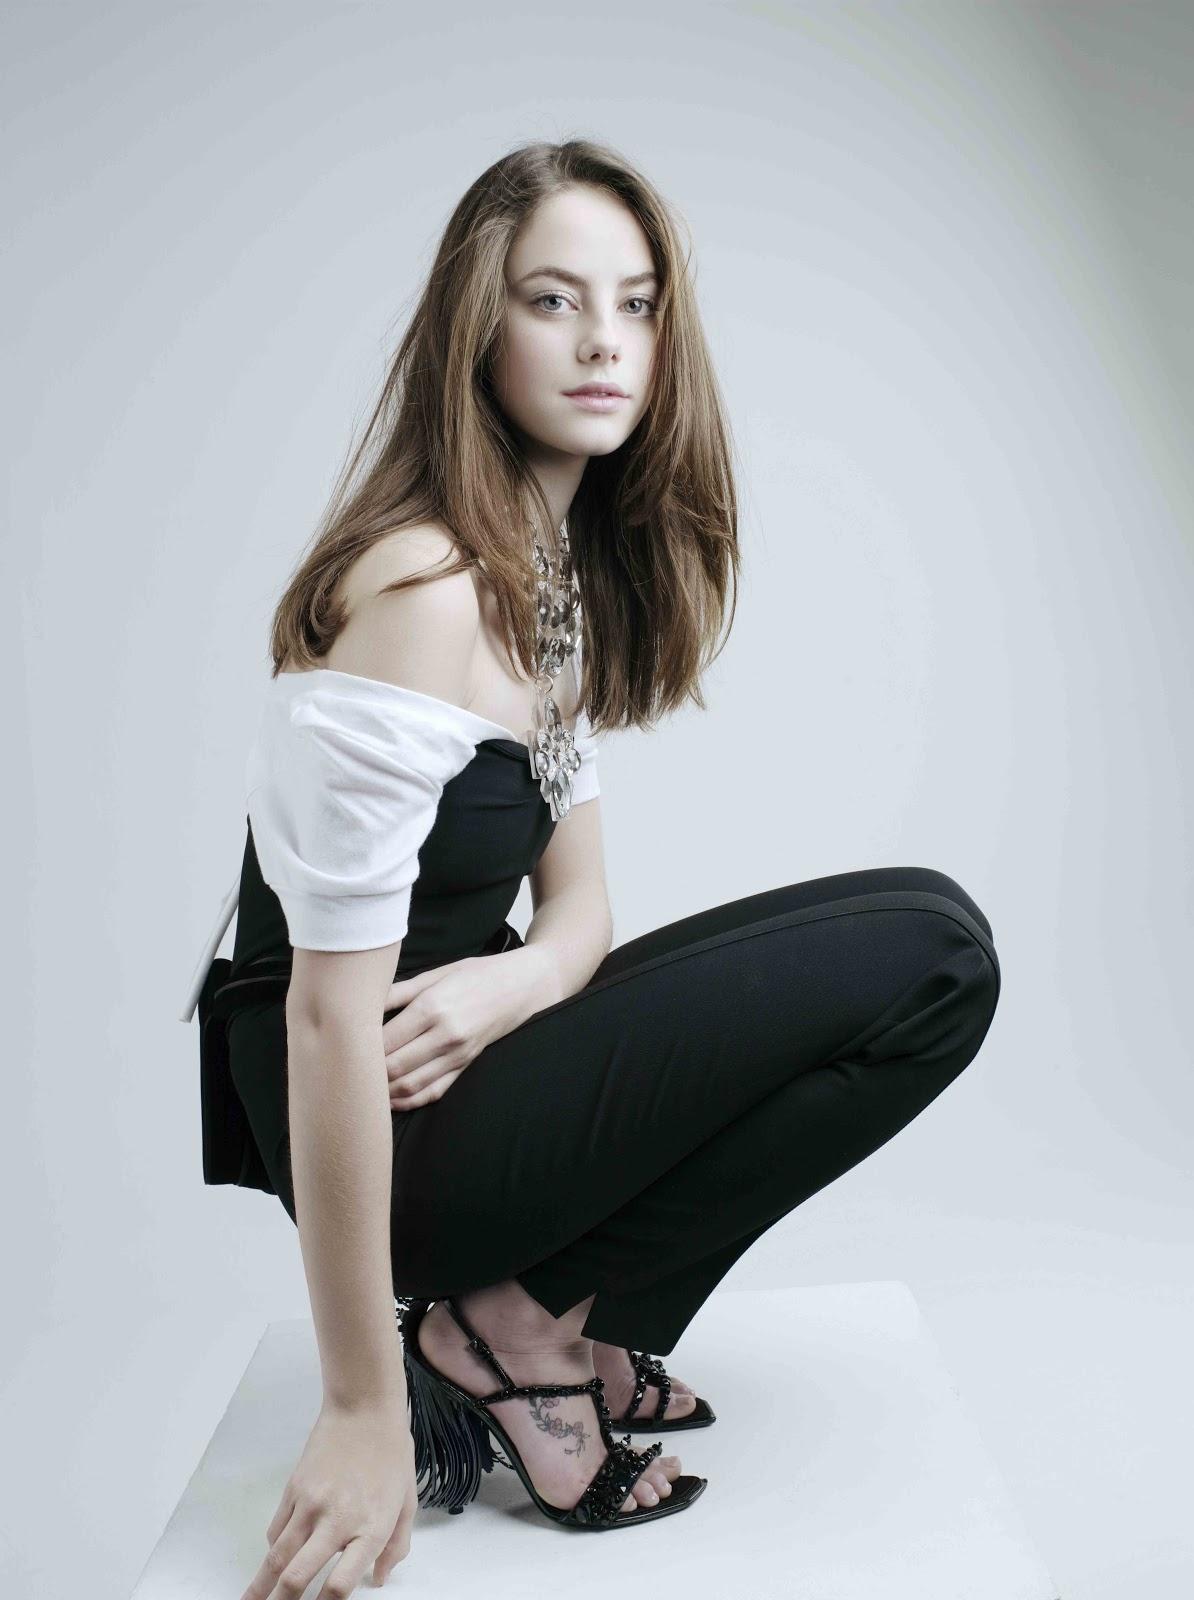 Kaya Scodelario #73 | the hottest females